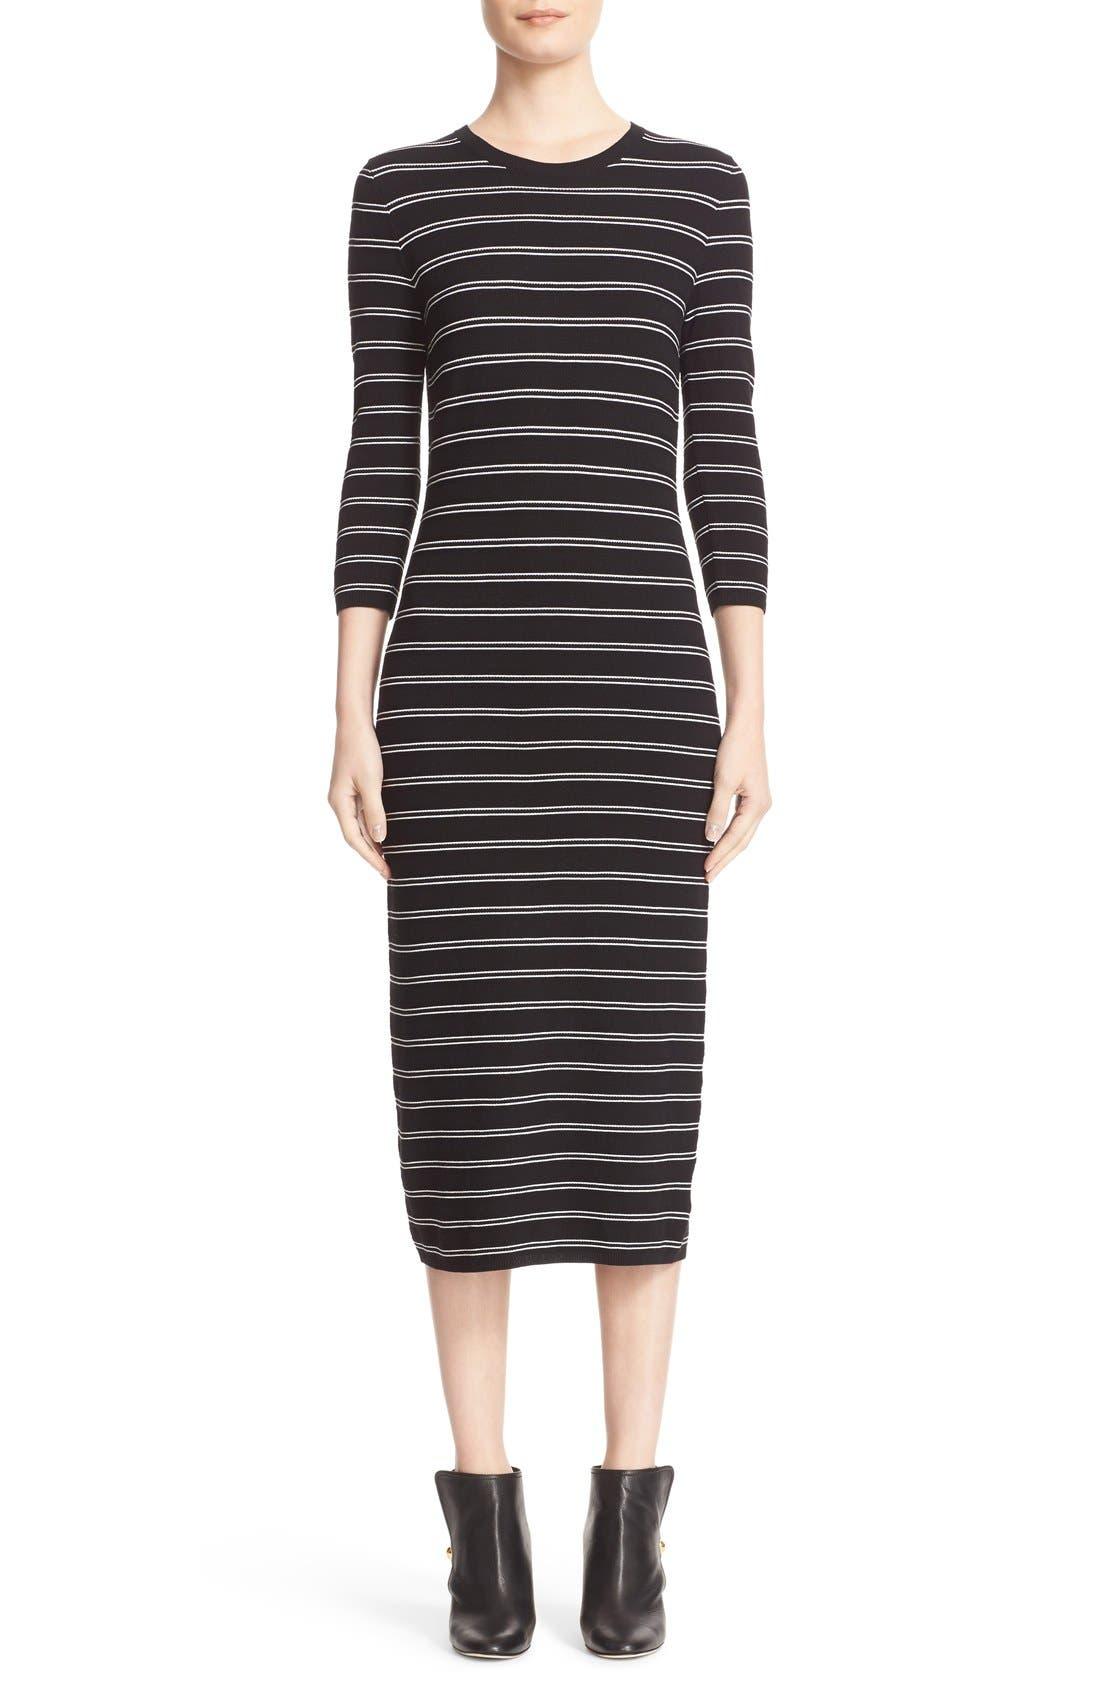 Main Image - Theory 'Delissa B' Stripe Textured Knit Maxi Dress